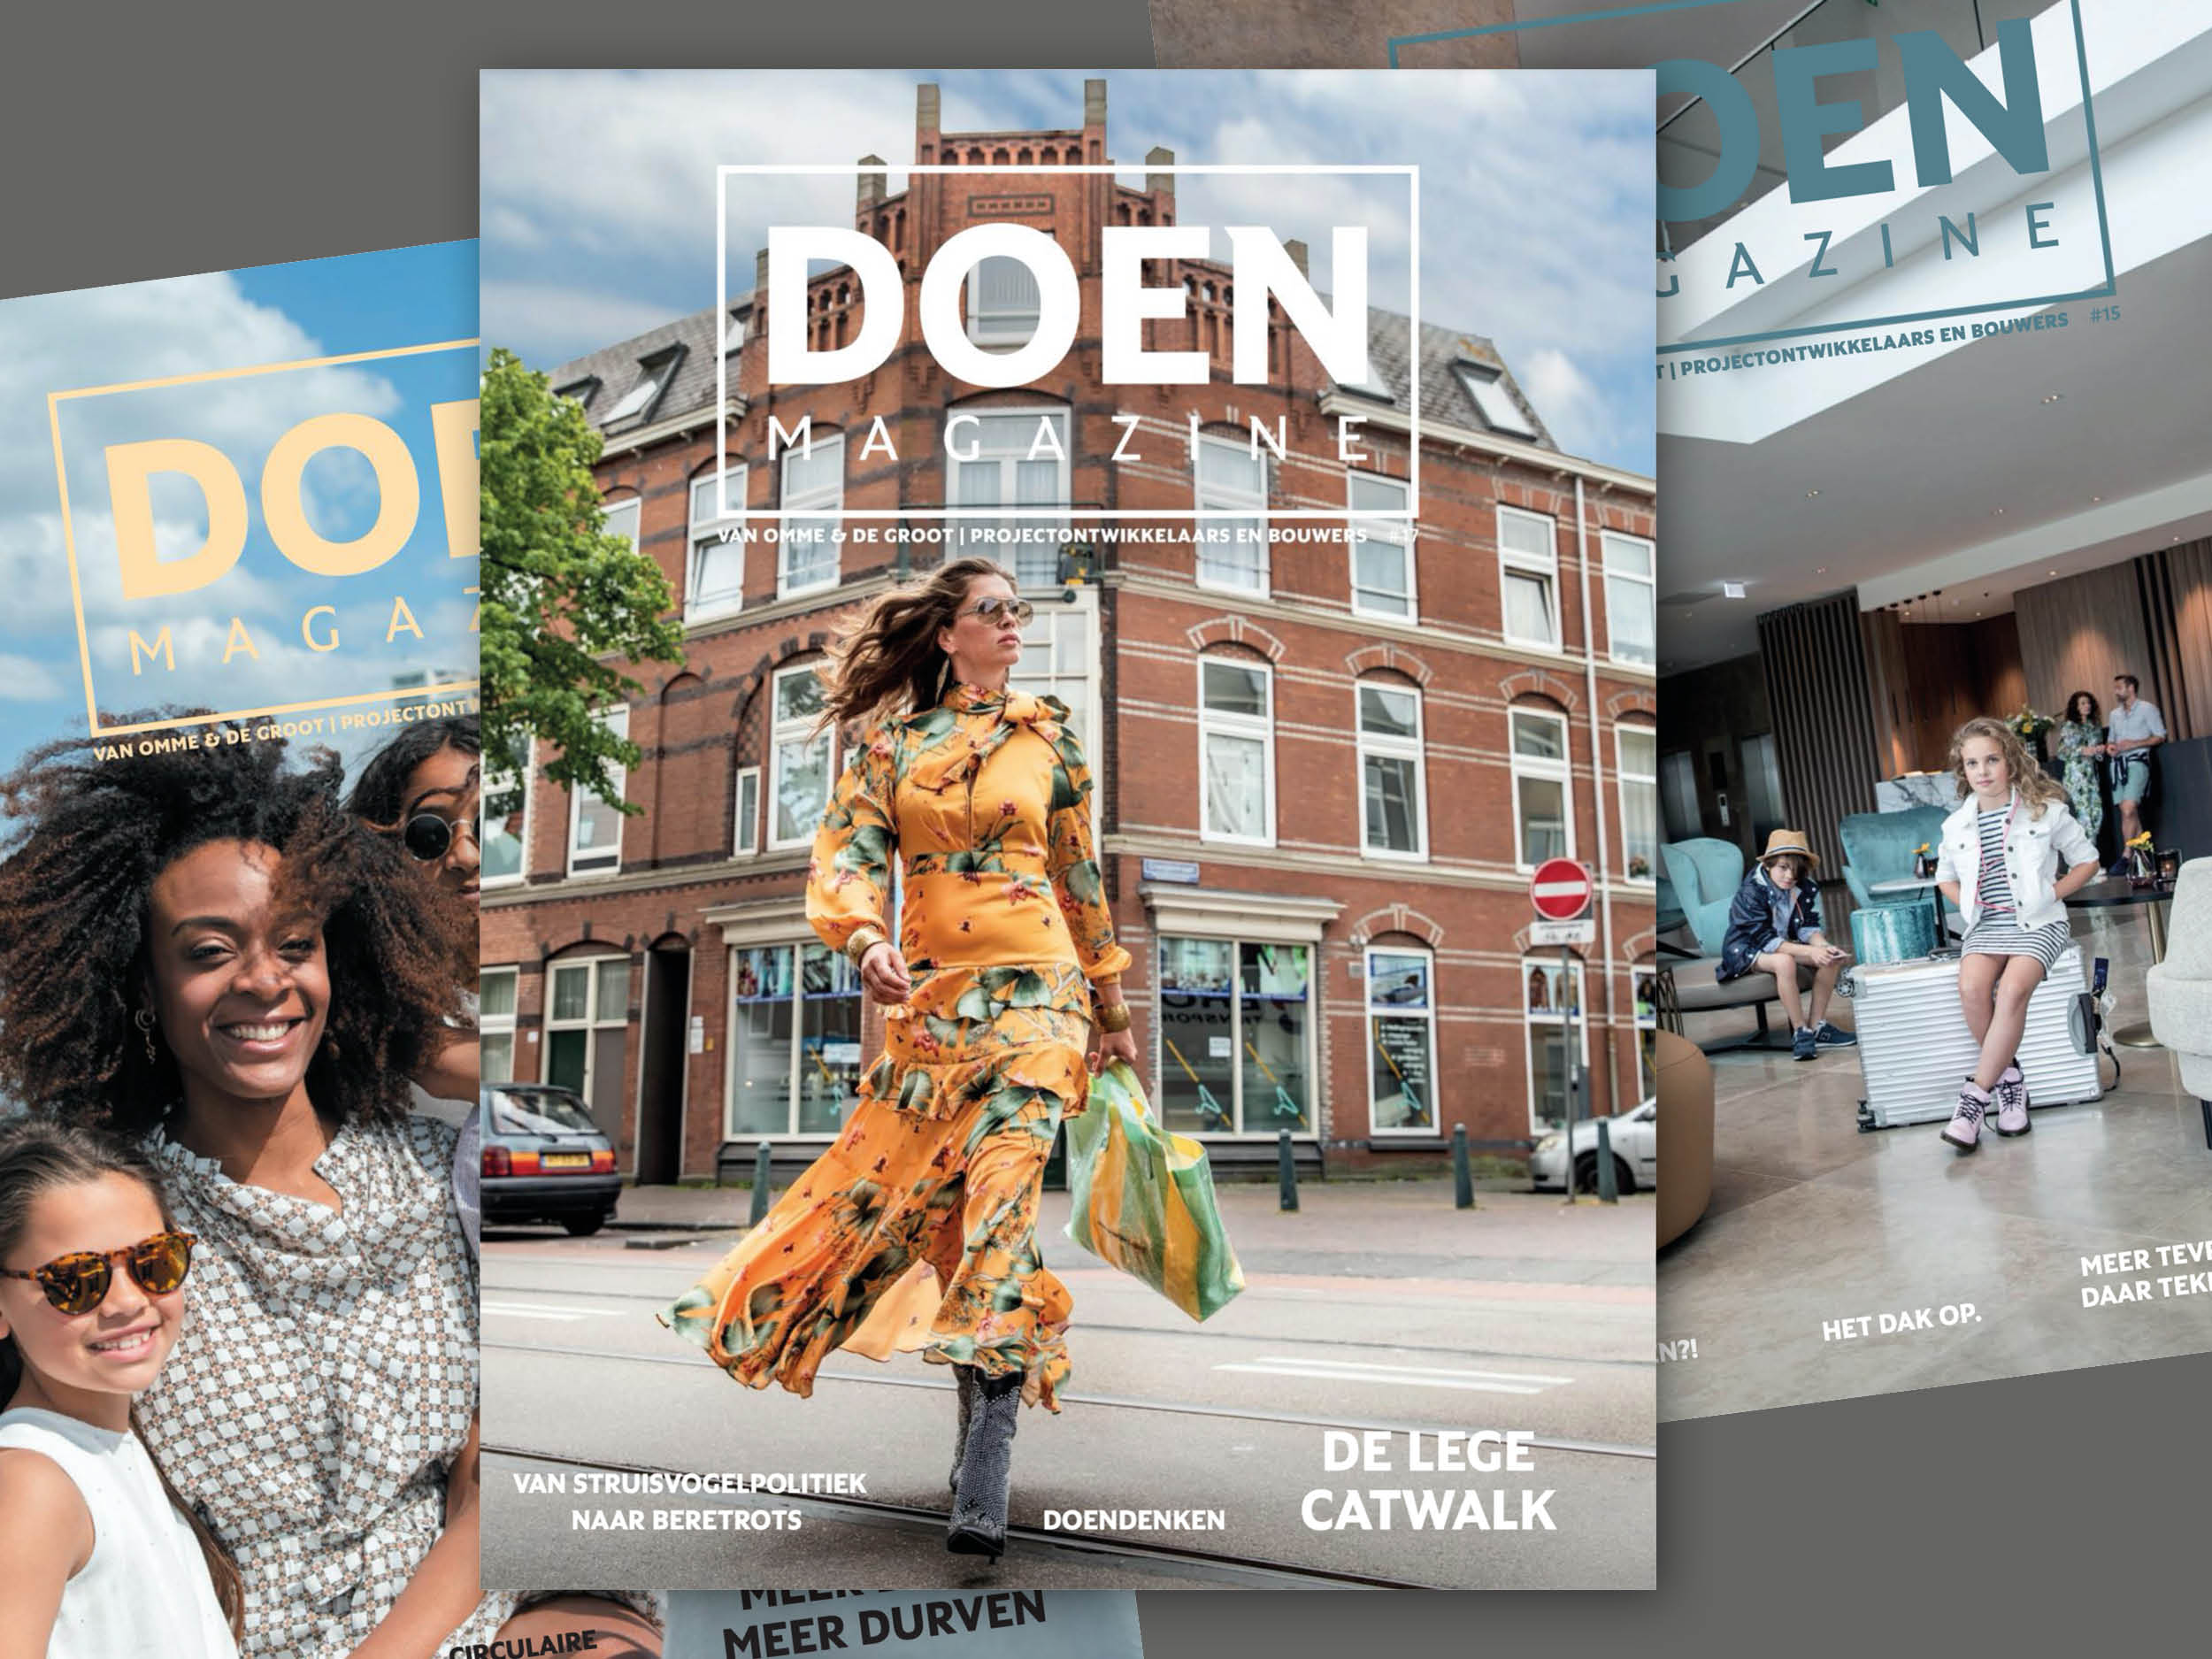 Bay House Doen magazine